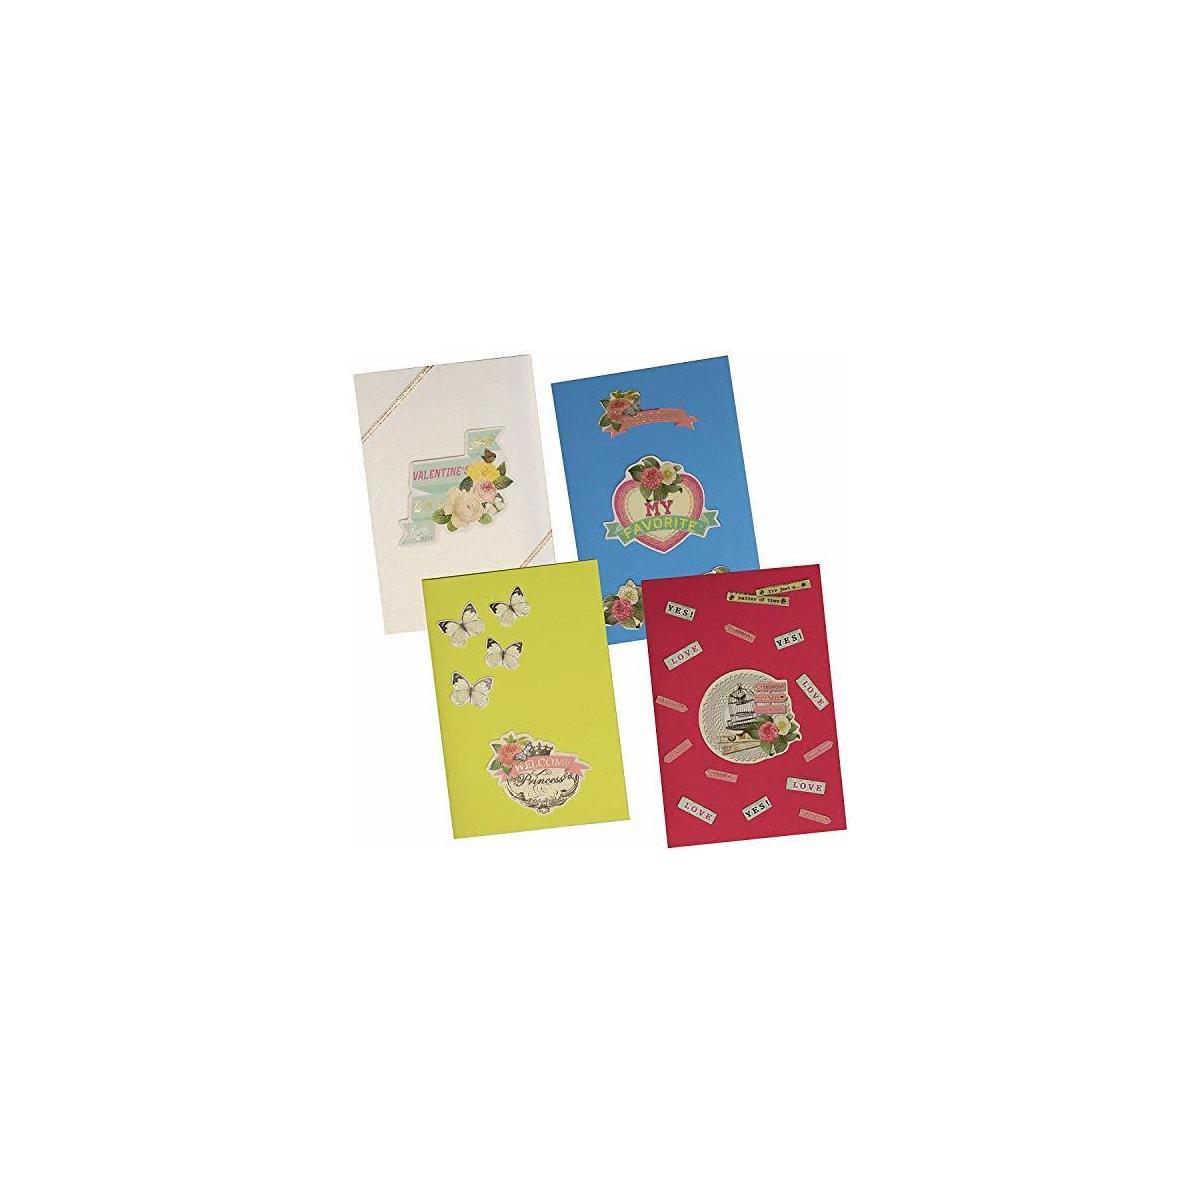 greeting card making kit pack  diy handmade greeting card